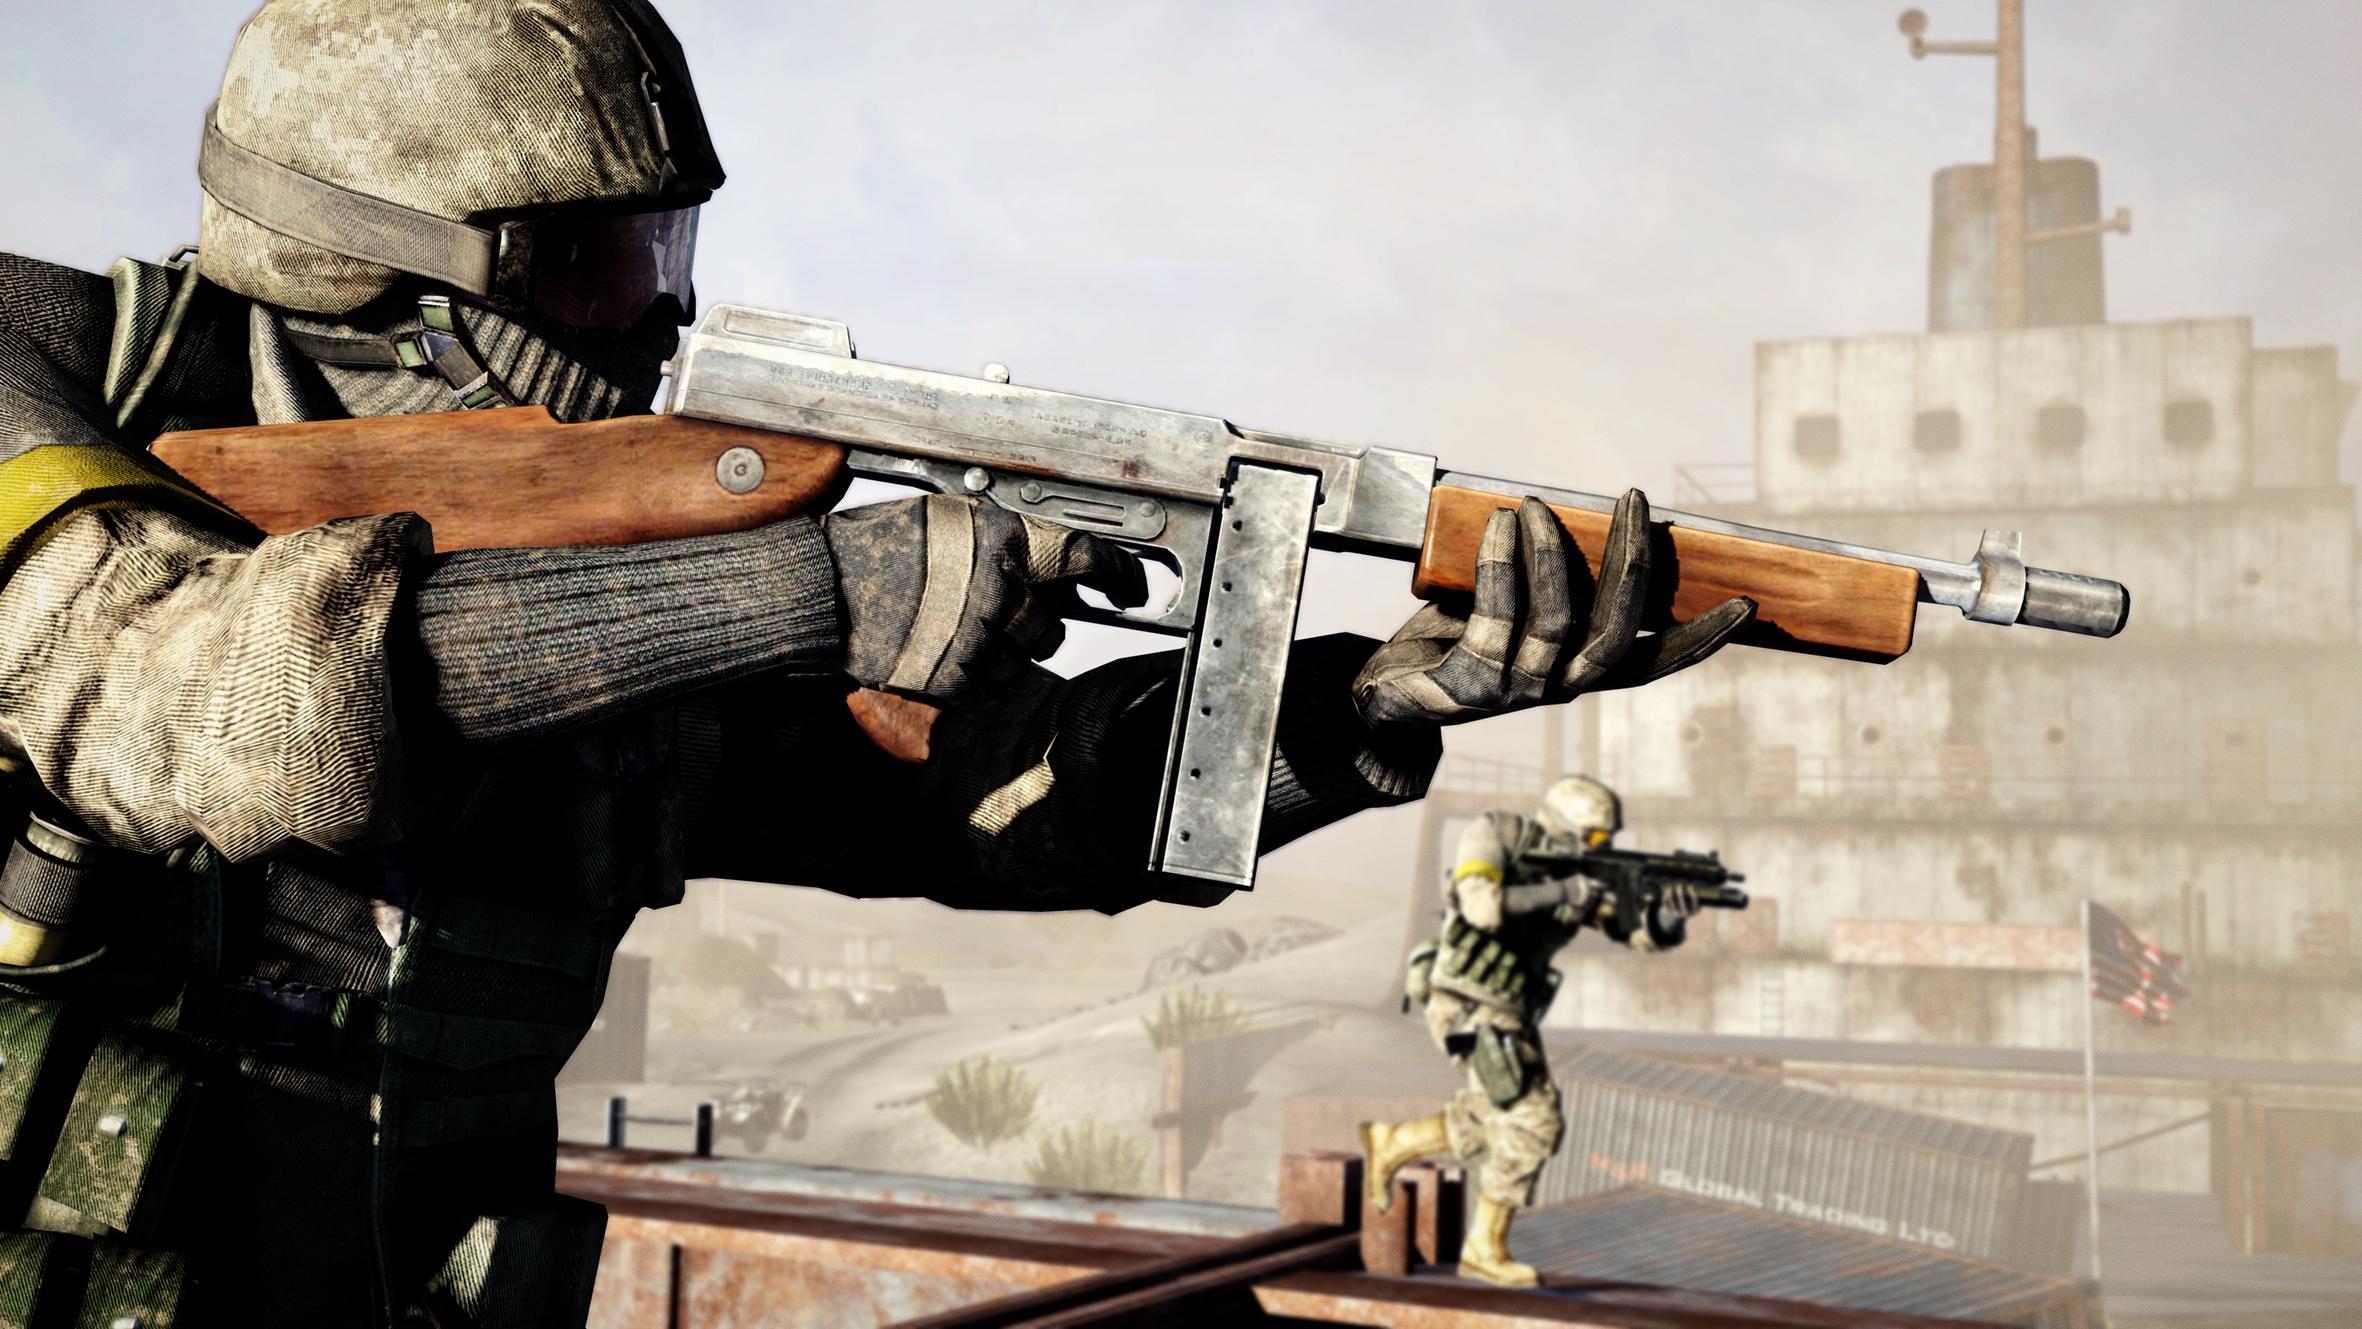 Battlefield Bad Company 2 image - Mod DB